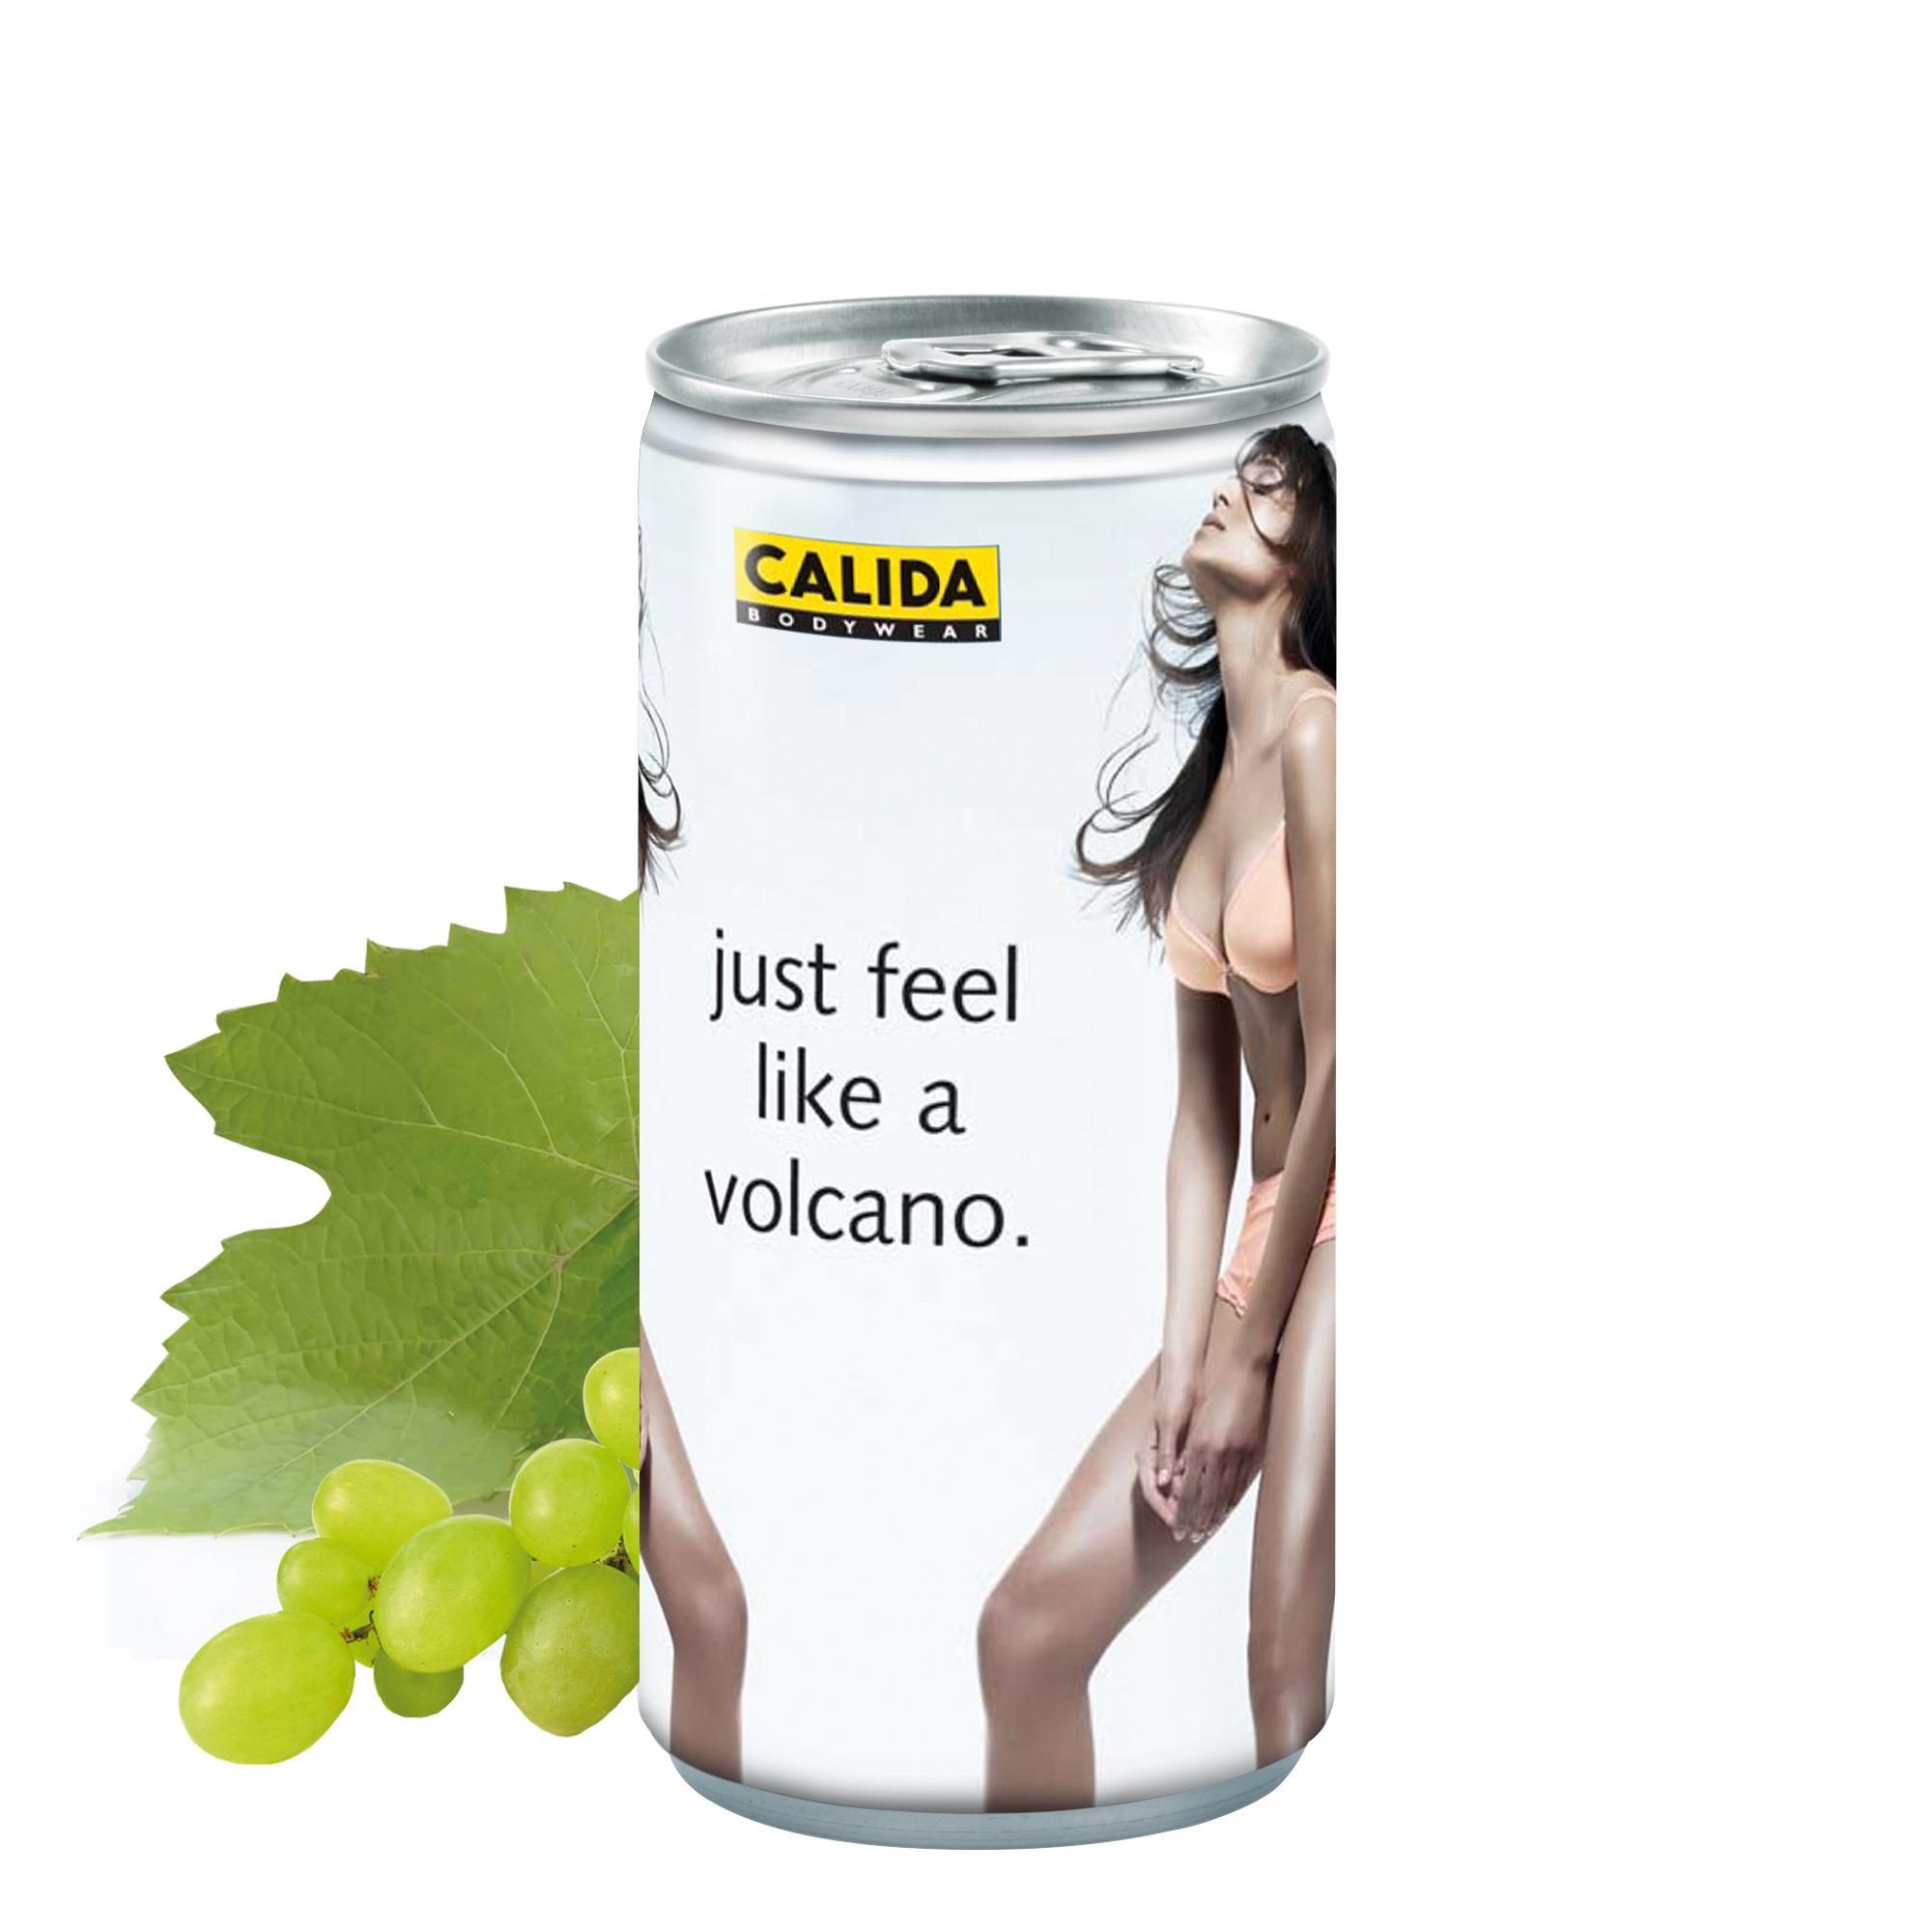 Secco, 200 ml, Fullbody